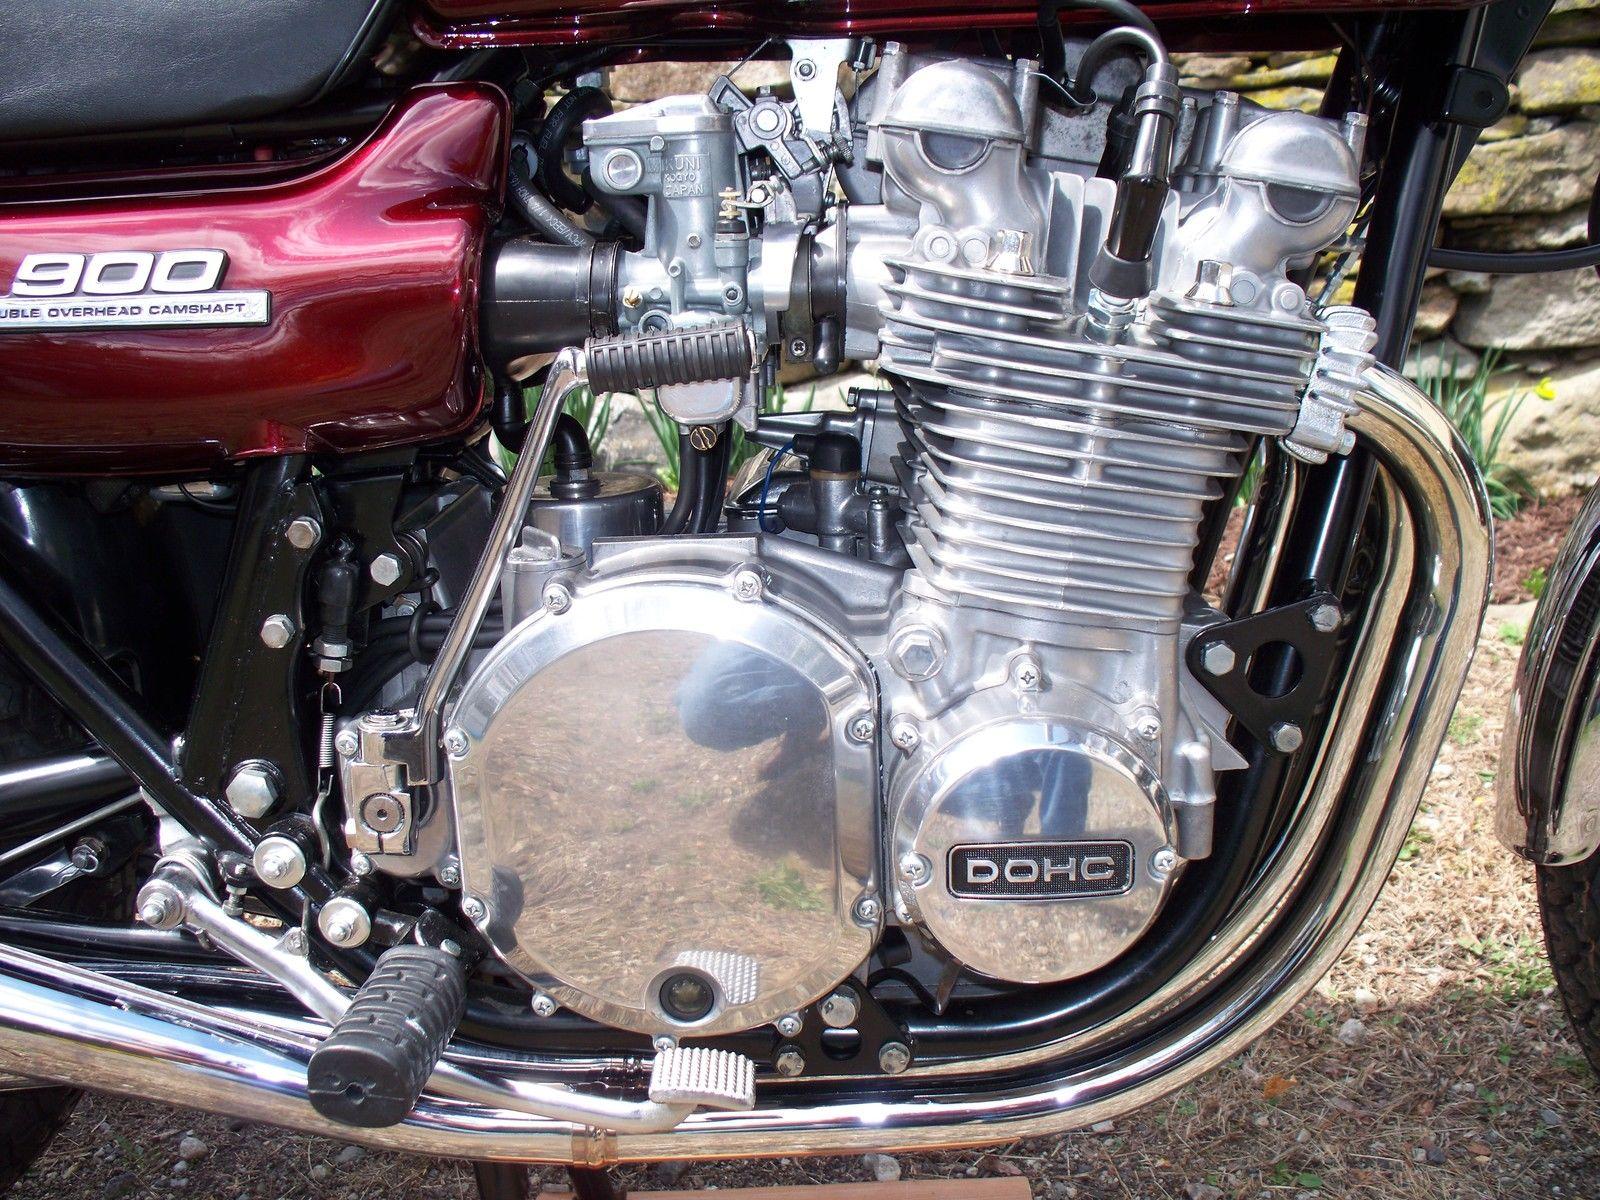 Kawasaki Z1 - 1975 - Brake Lever and Footrest.